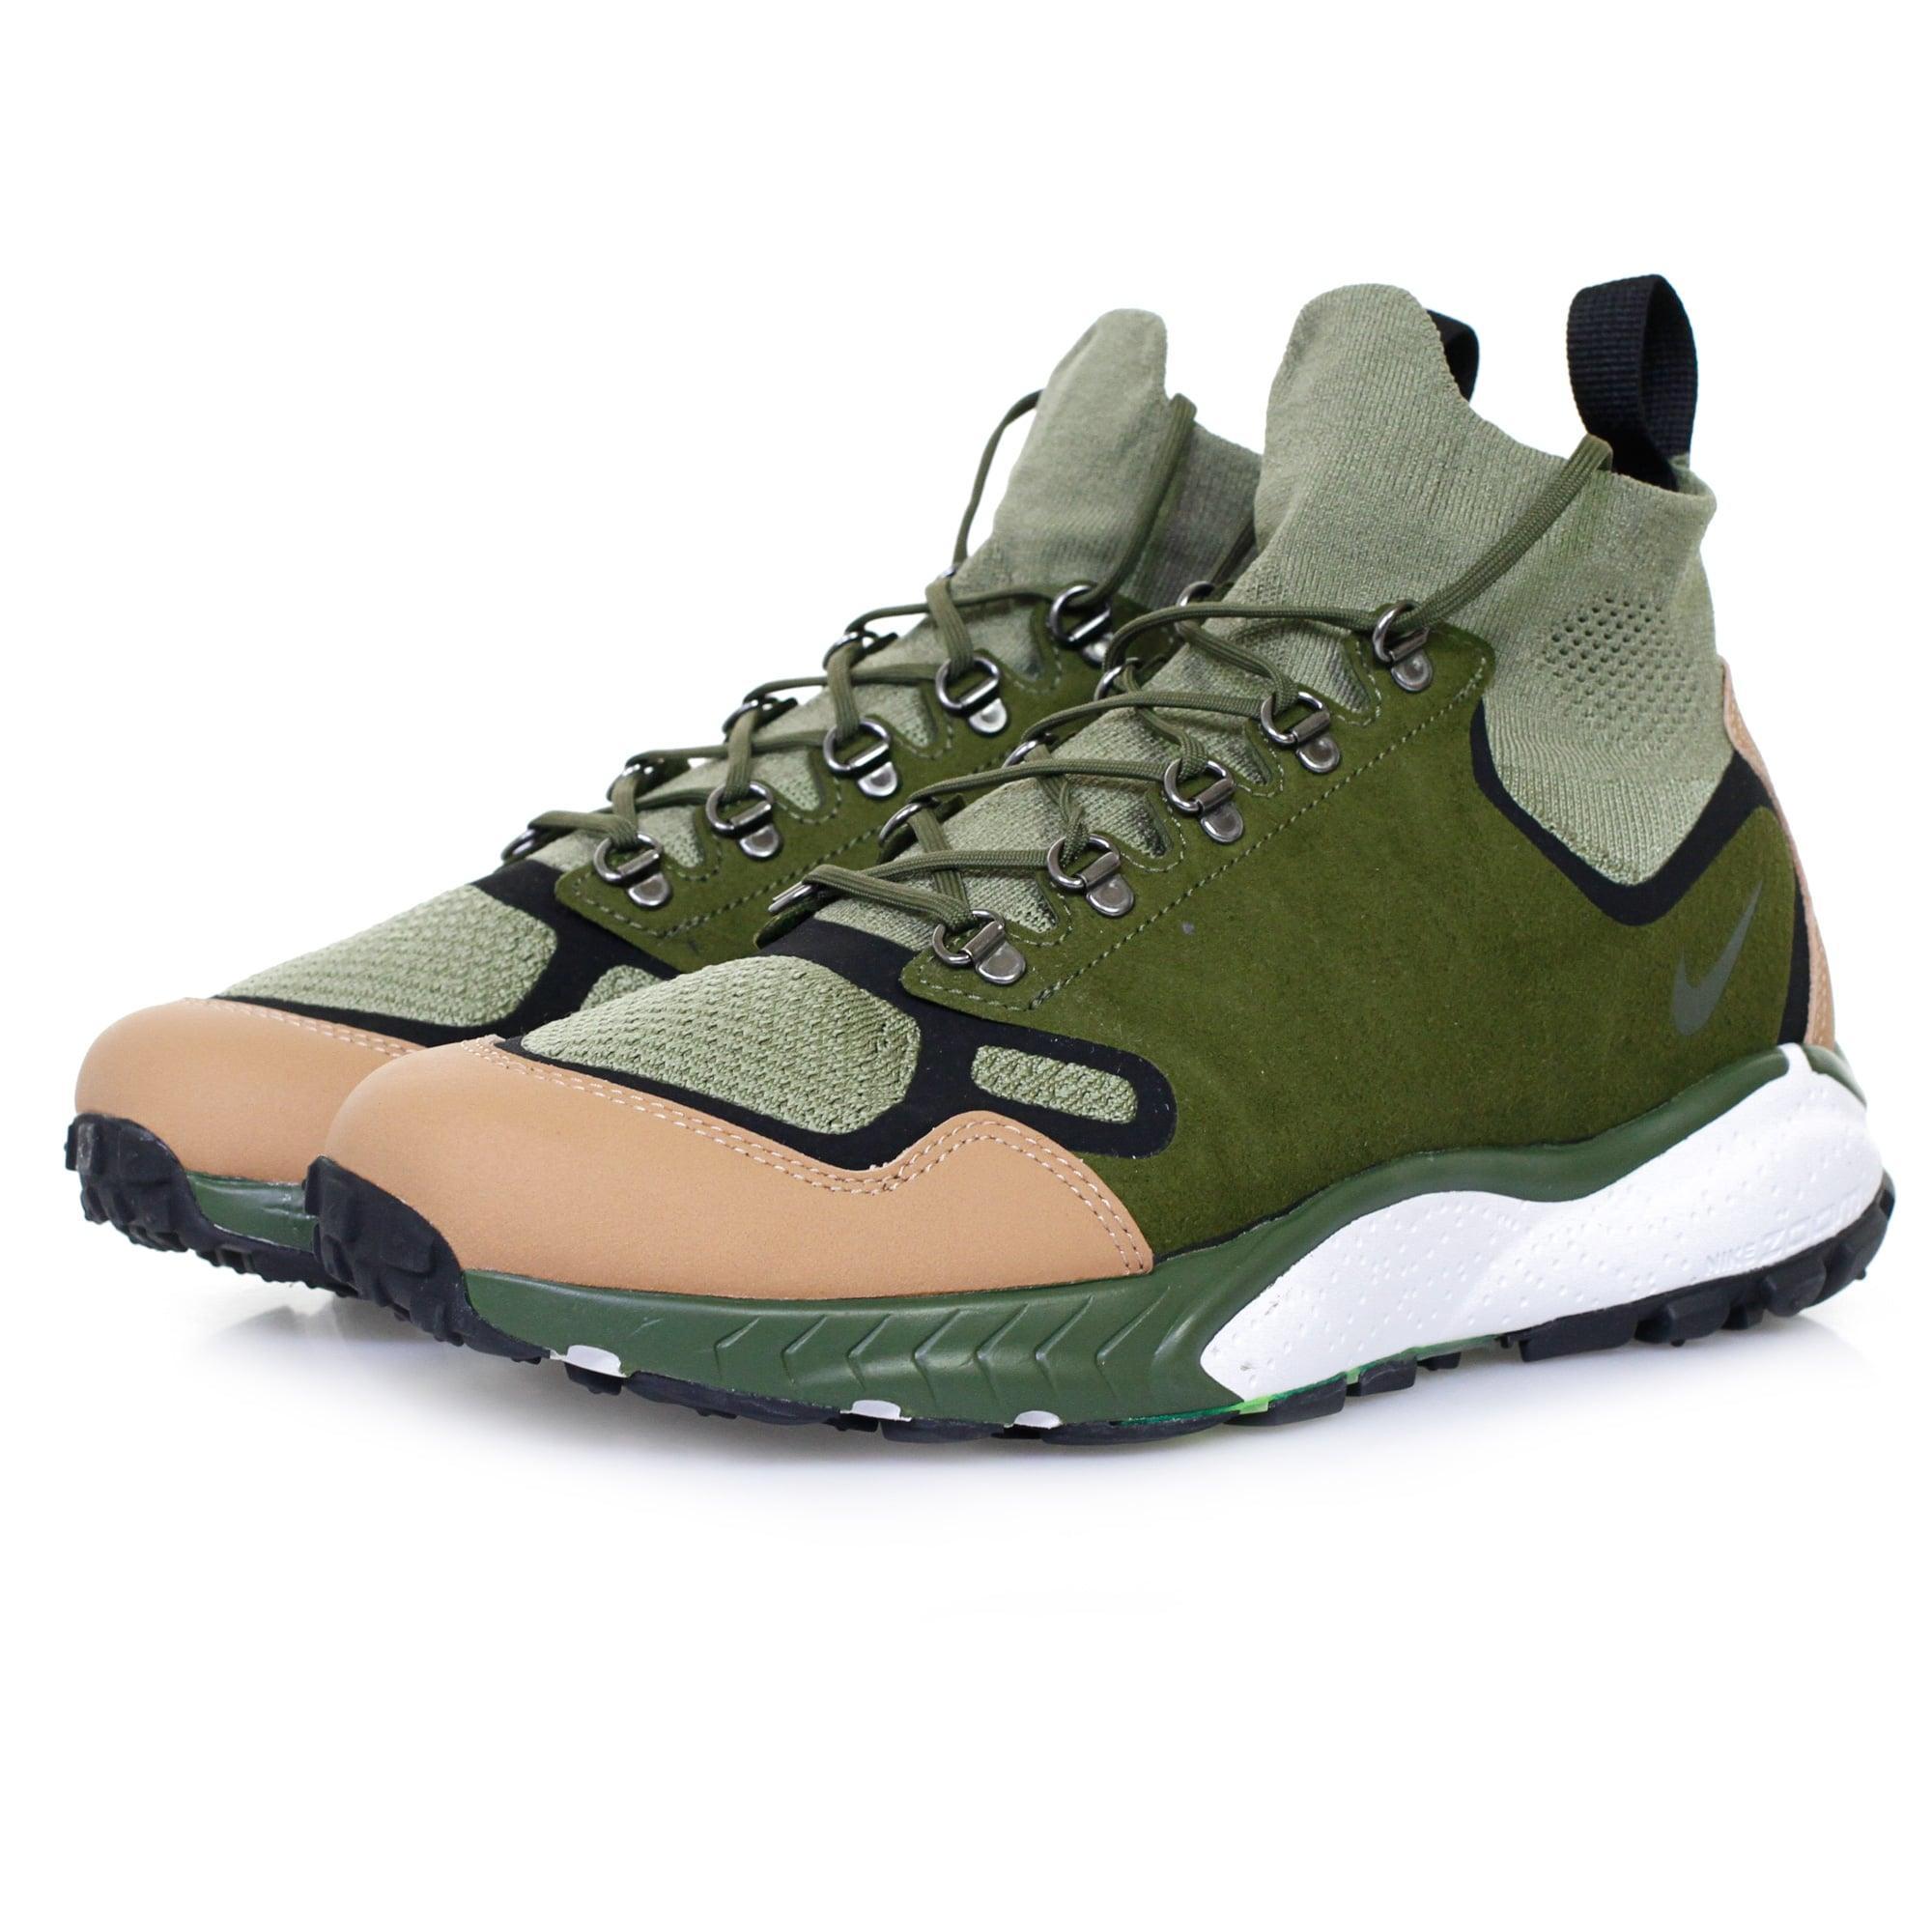 34d0c0bef991e Lyst - Nike Air Zoom Talaria Mid Fk Prm Palm Green Shoe 875784 300 ...